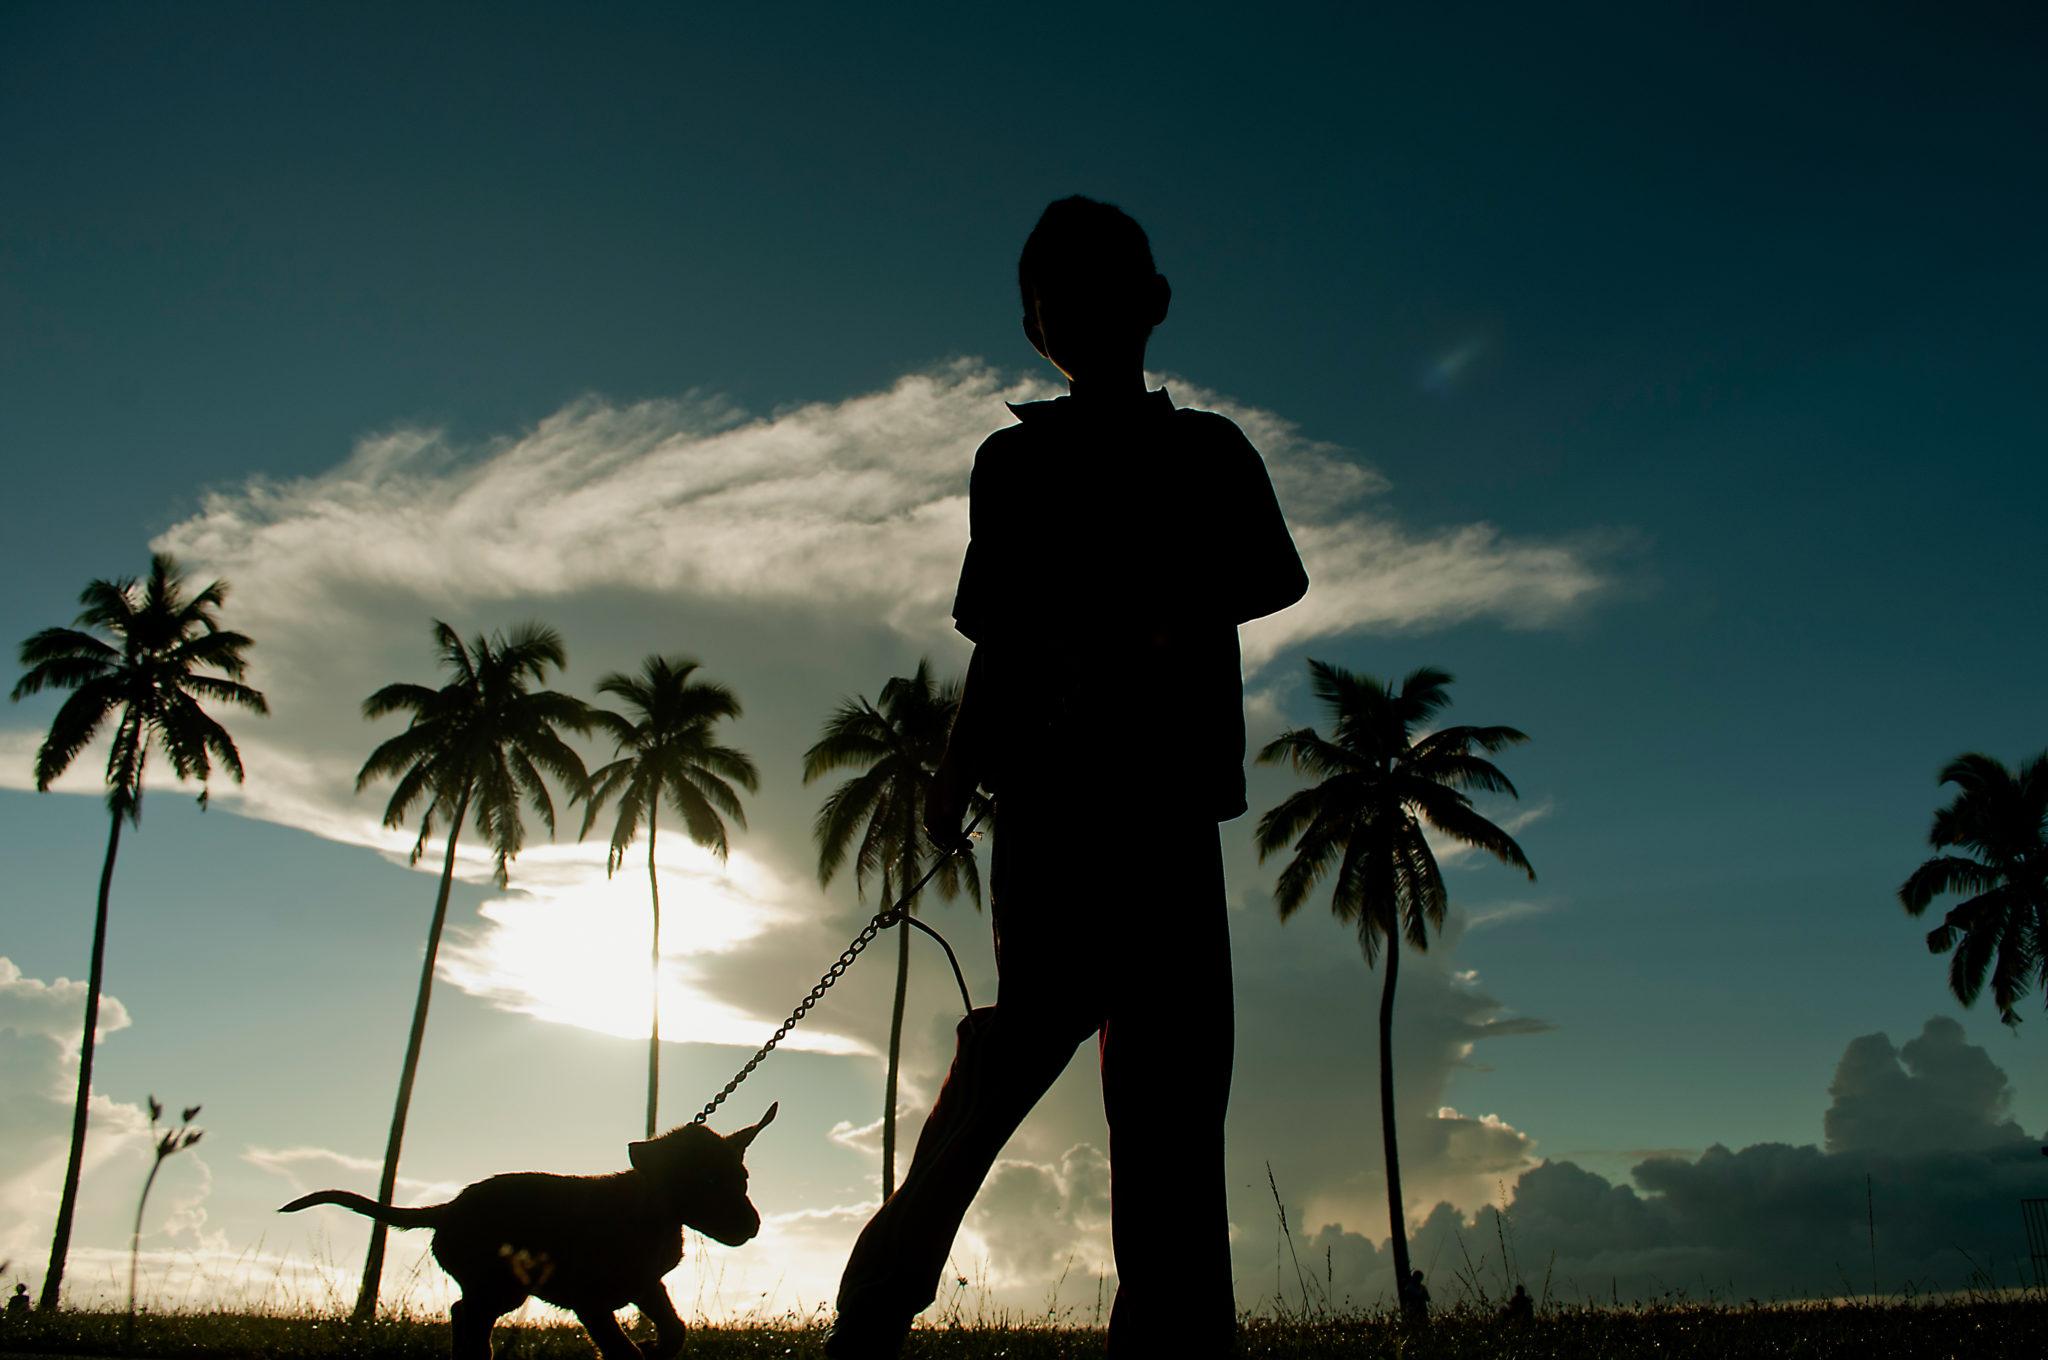 Fidschi-Inseln-Junge-Hund